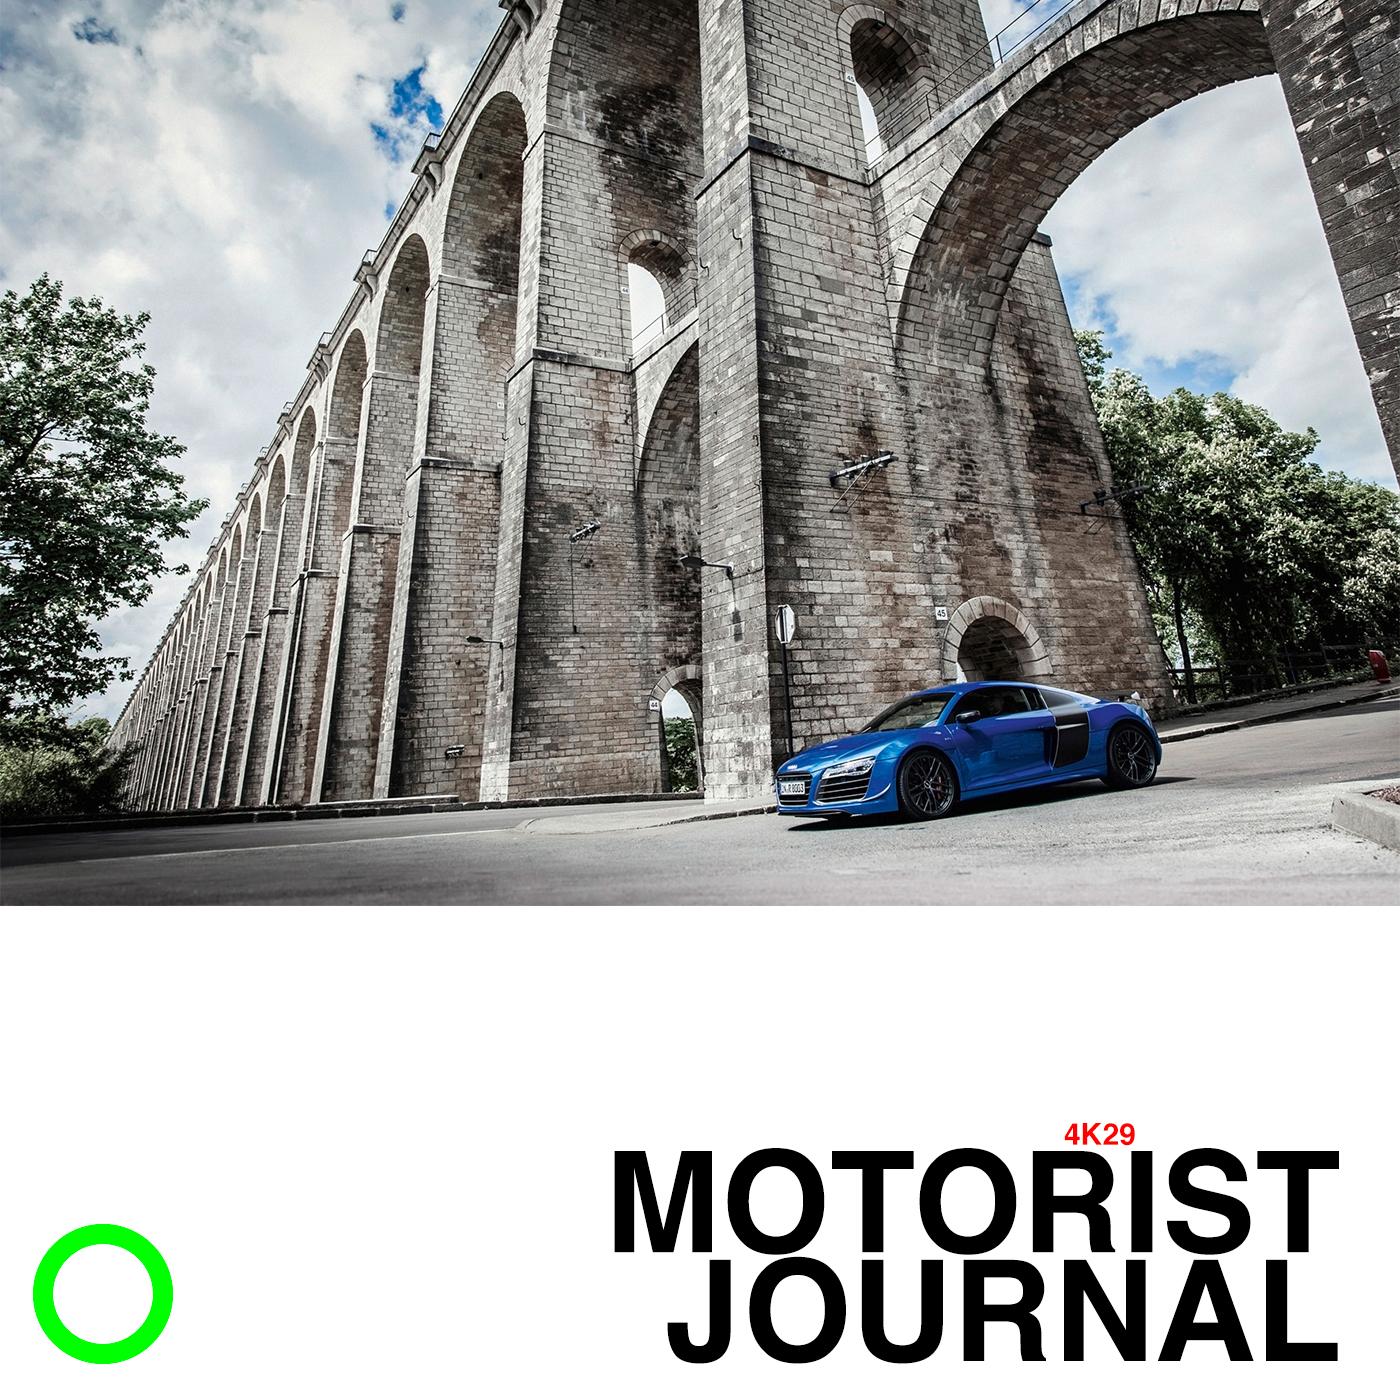 MOTOR JOURNALIST 4K29